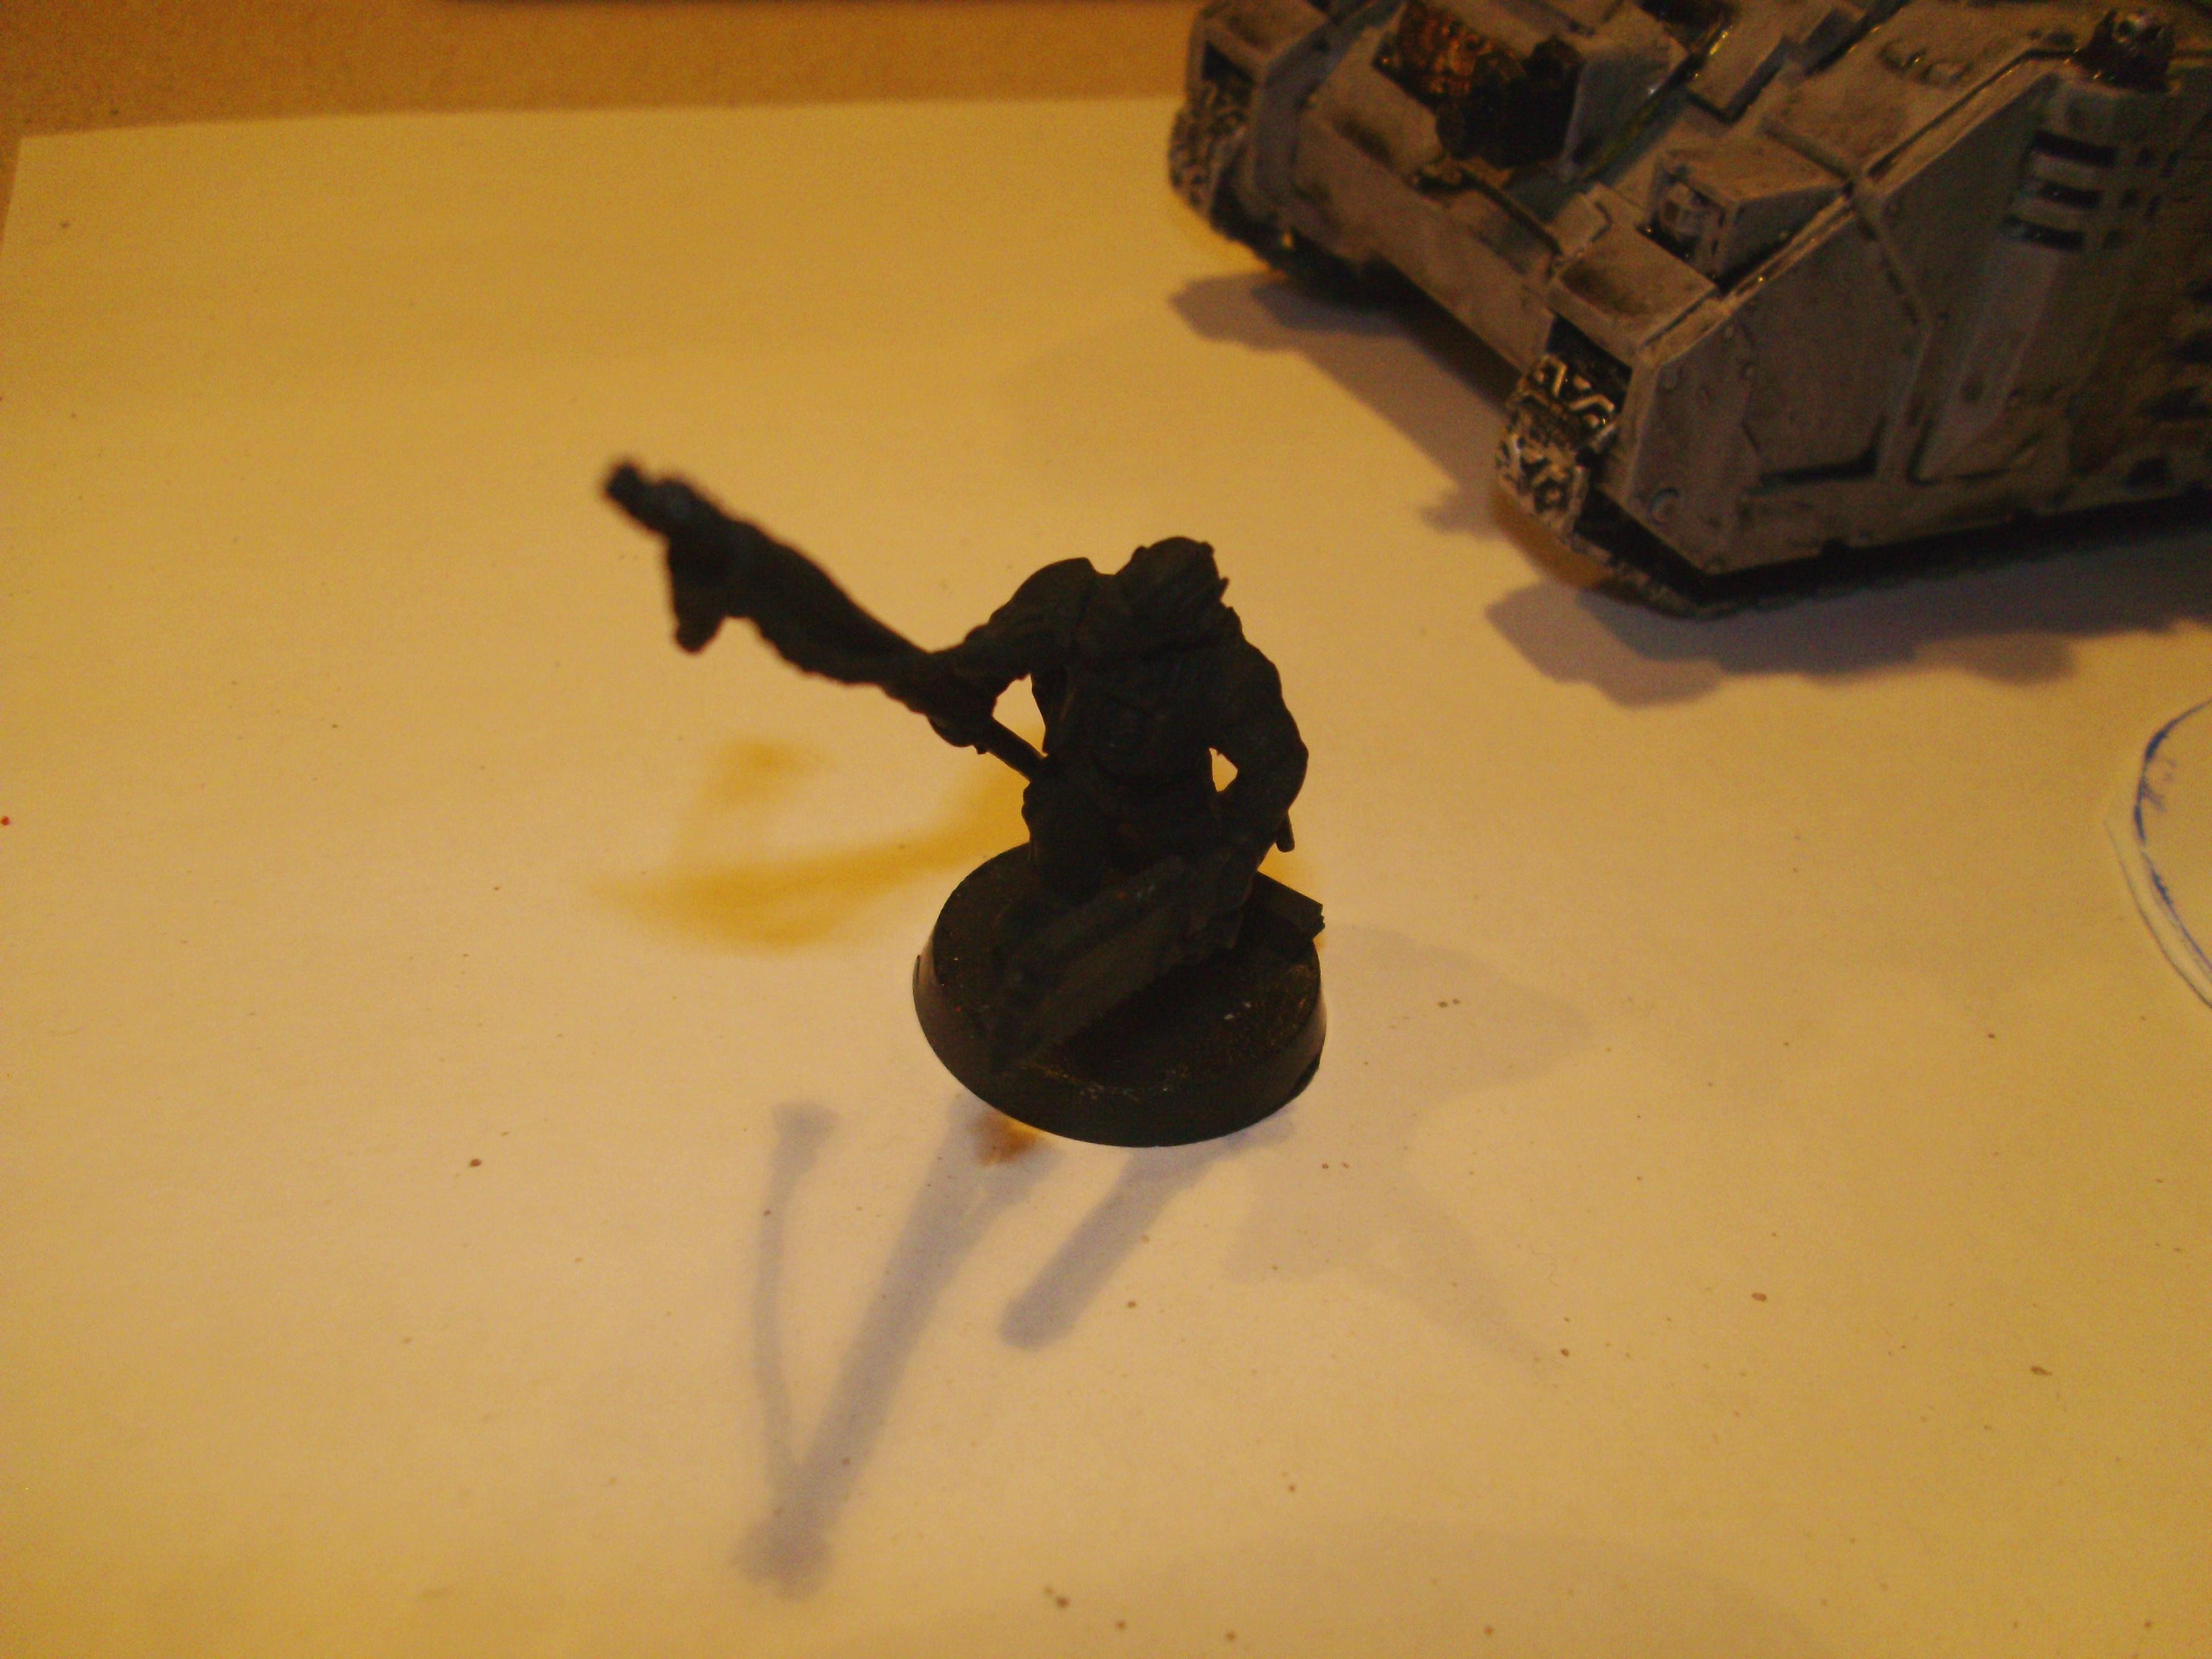 Imperial Priest kitbash, minus paint